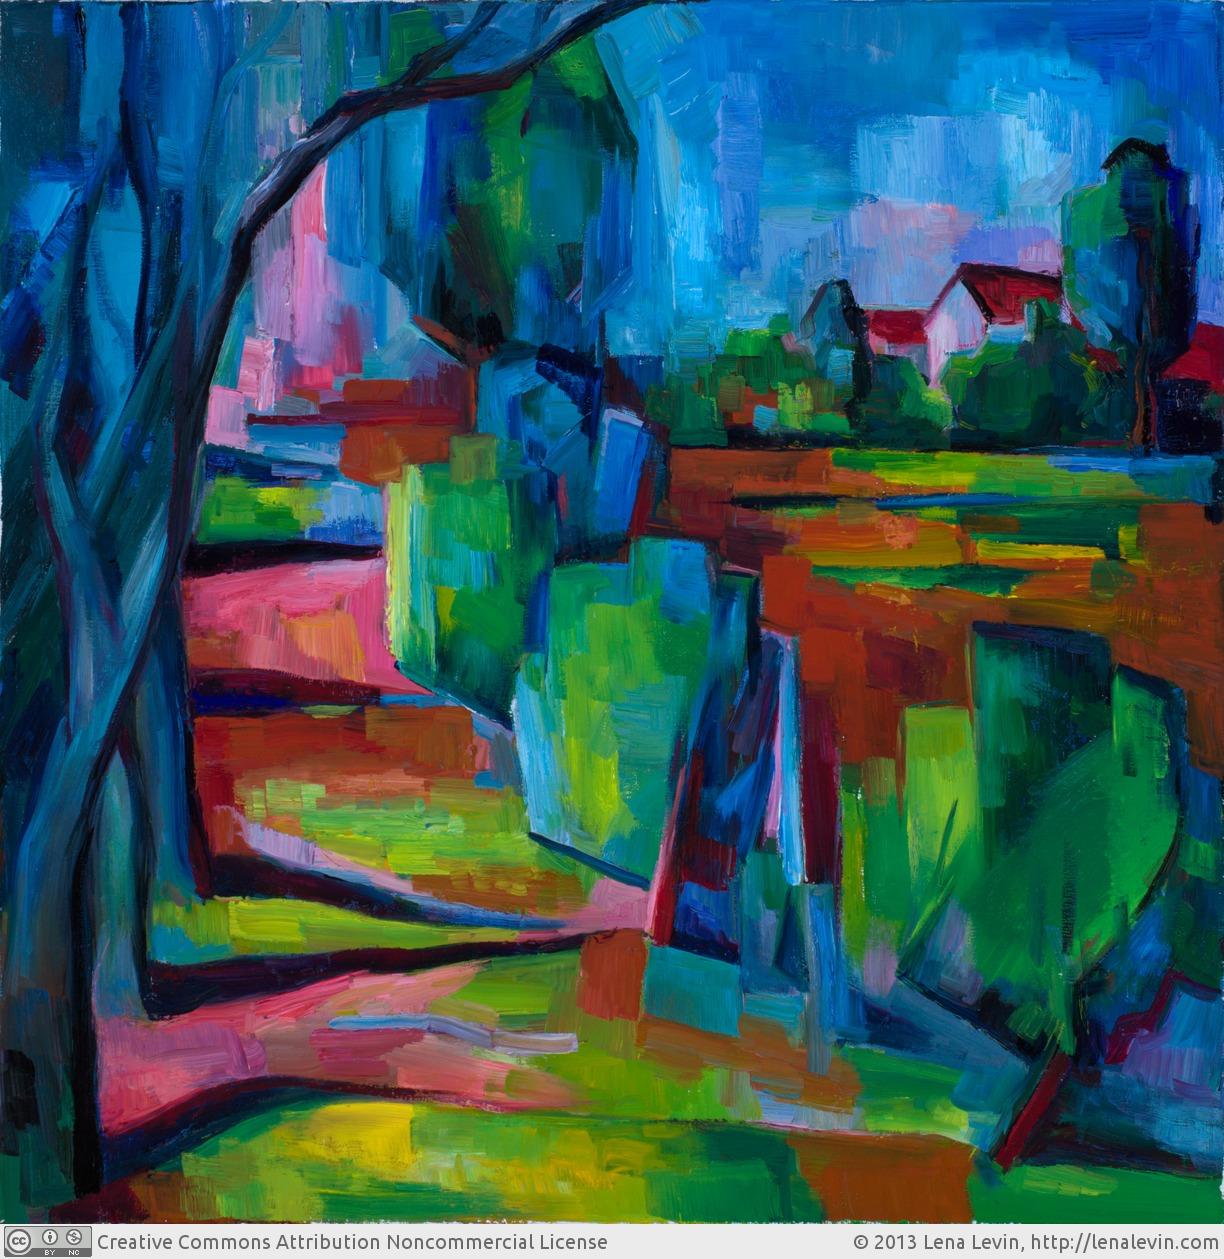 Lena Levin. Sonnet 50: How heavy do I journey on the way